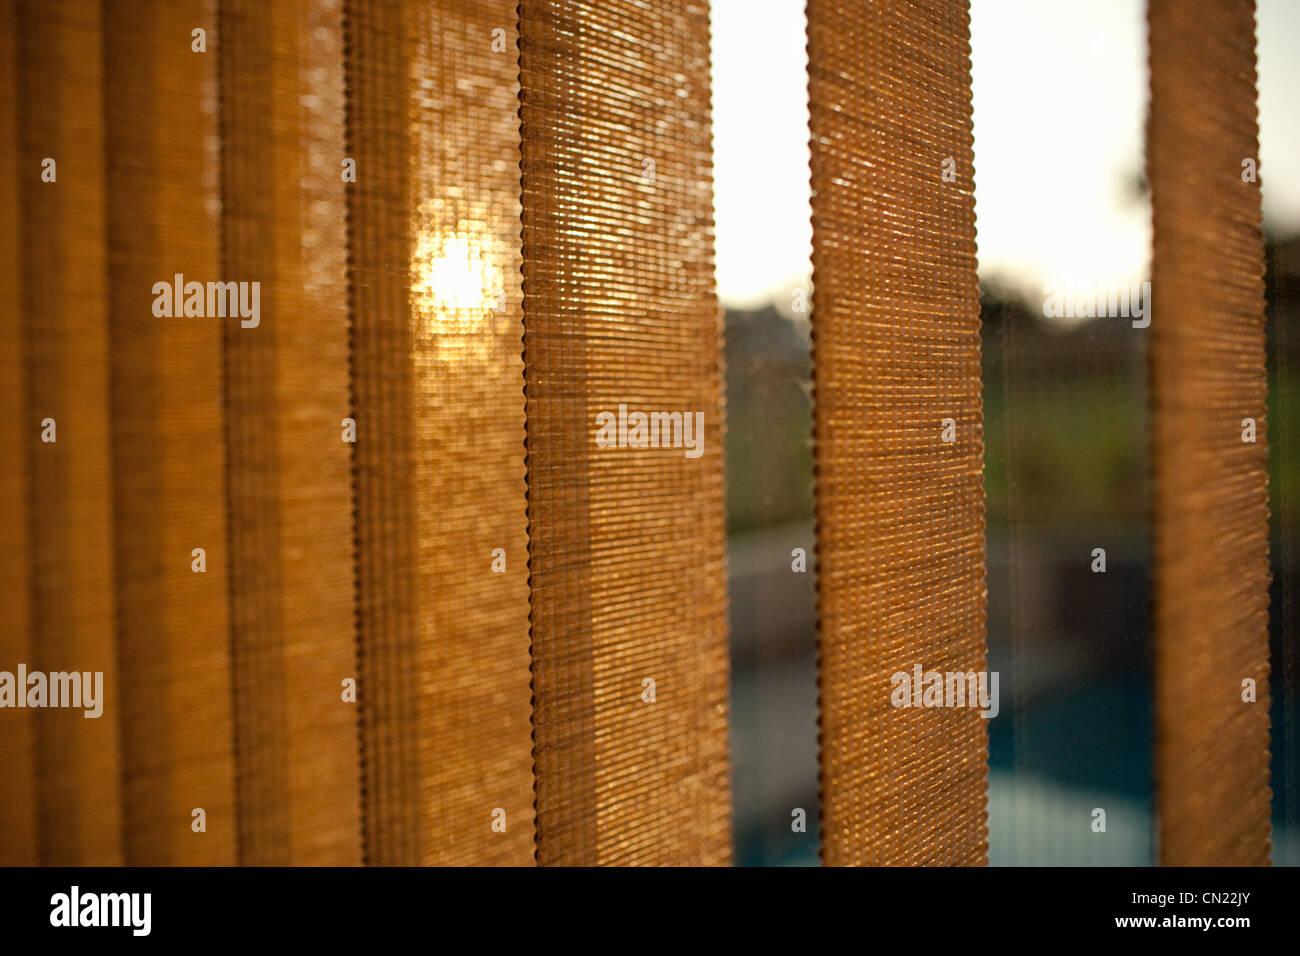 Fenstervorhänge bei Sonnenuntergang Stockbild